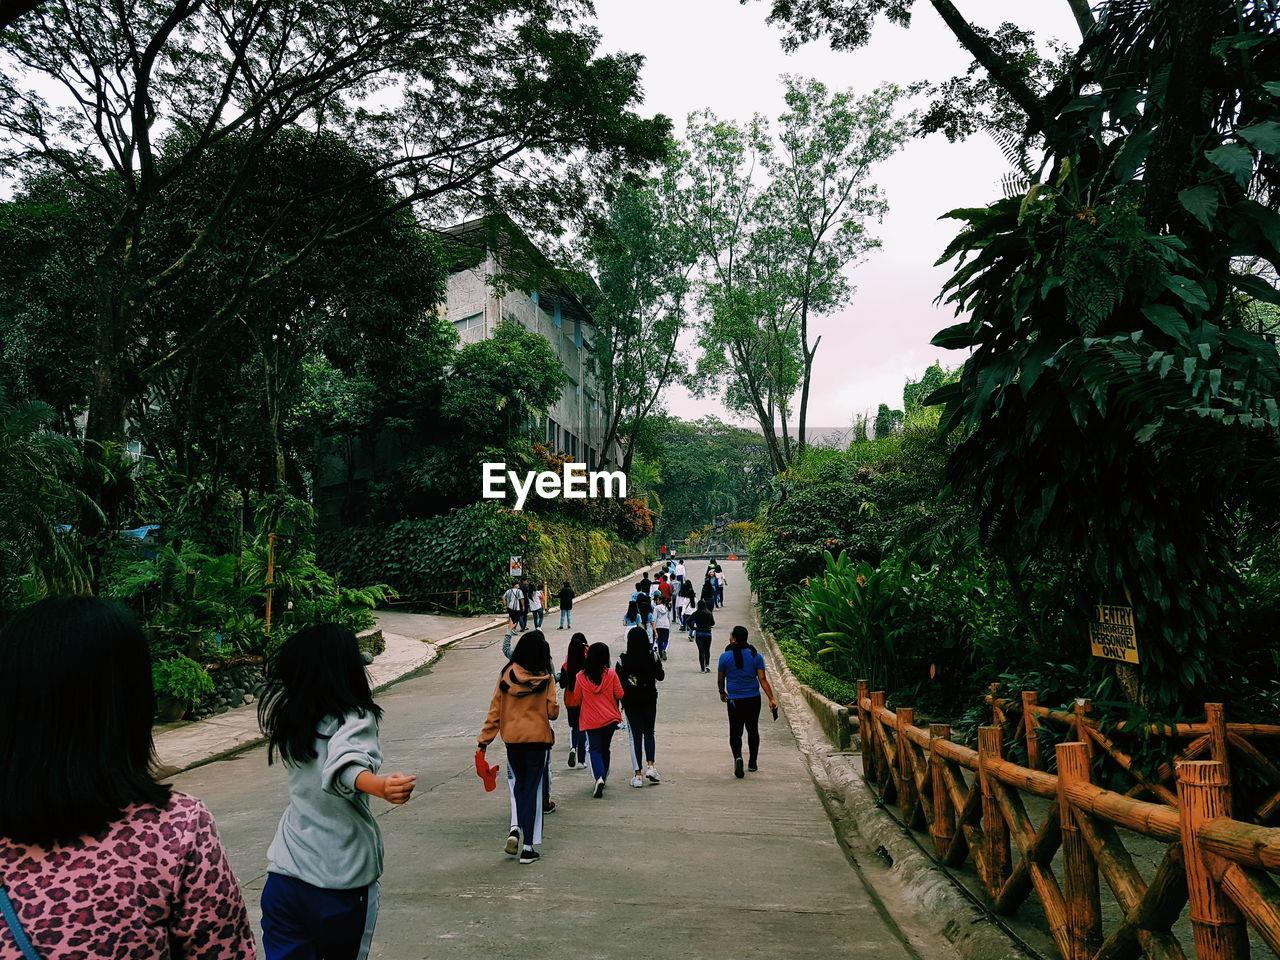 REAR VIEW OF PEOPLE WALKING ON FOOTPATH AMIDST PLANTS